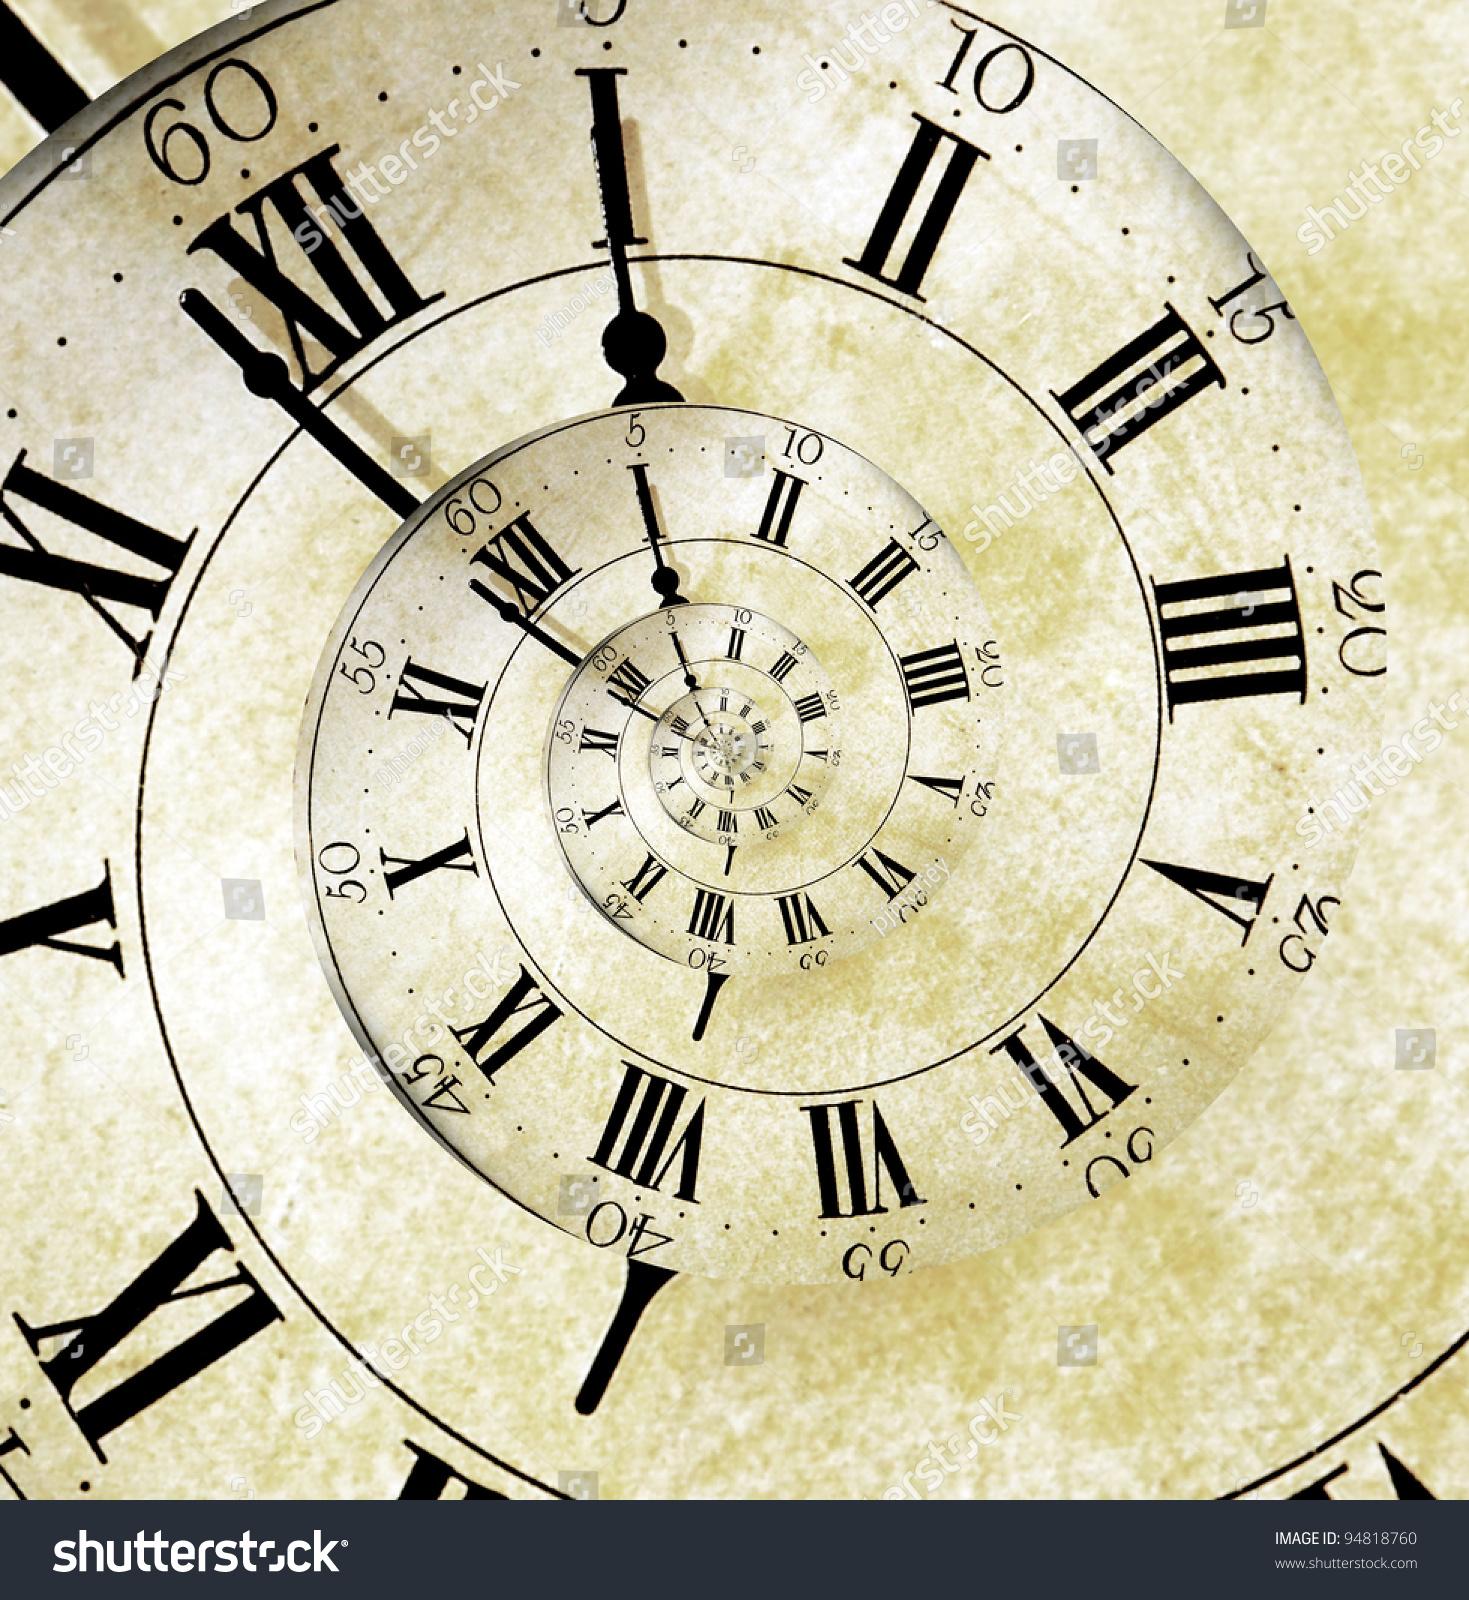 Clock Tattoo Meaning Ideas amp Designs  Owl amp Gear